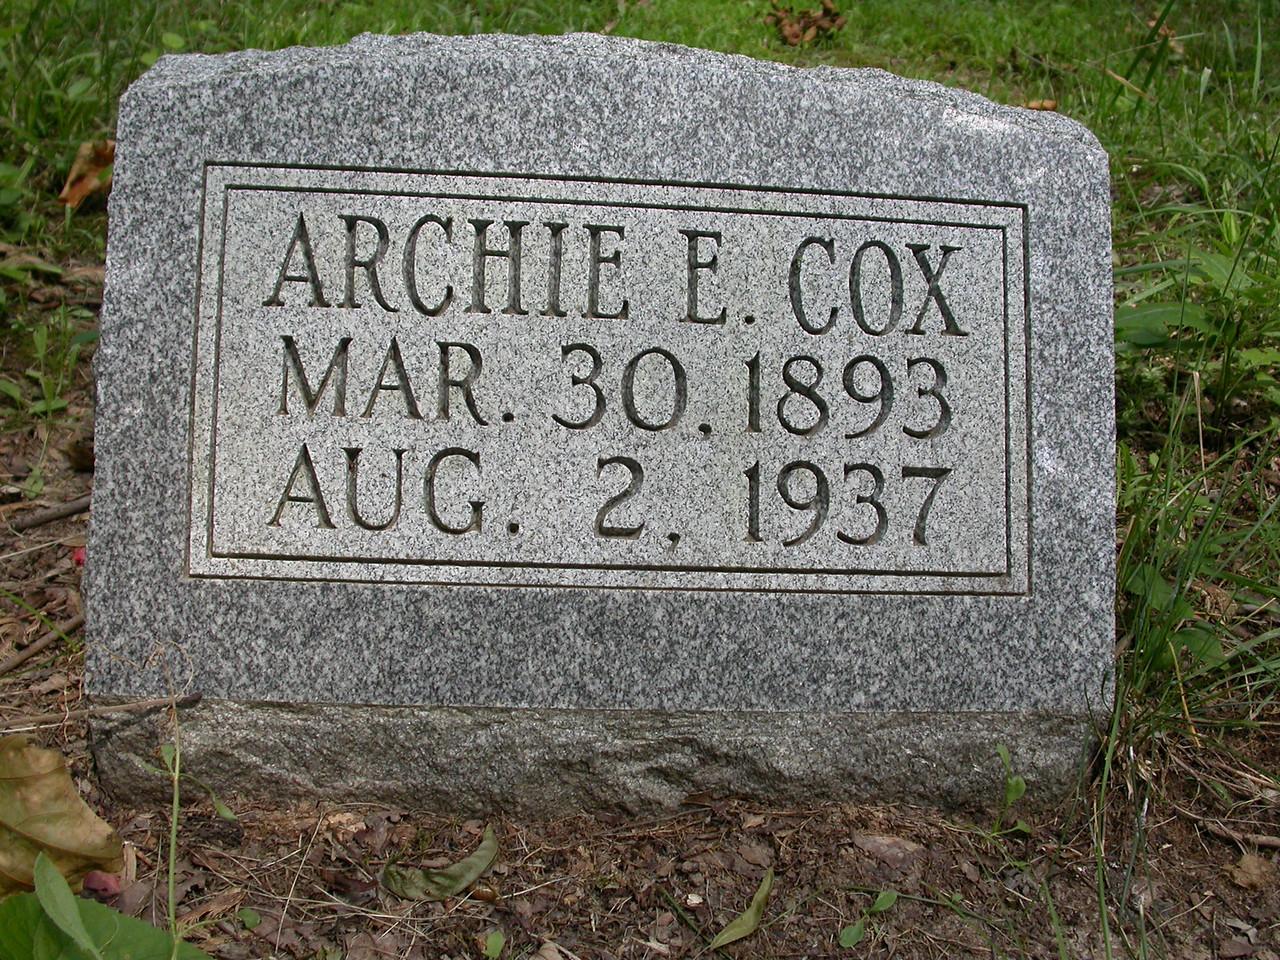 Located at Joppa Church cemetery, northern Vigo County, Indiana.